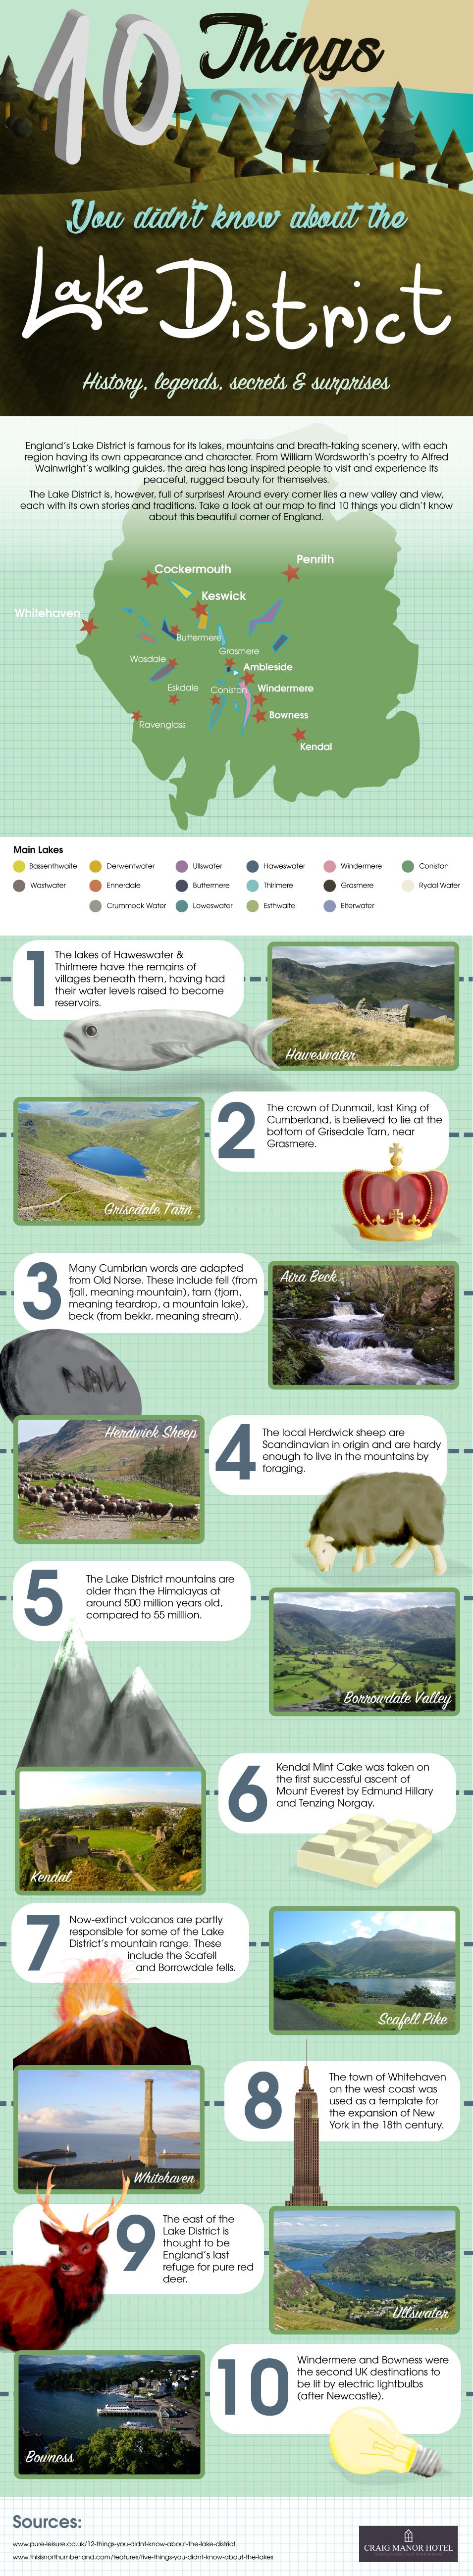 Lakes-Facts-V4